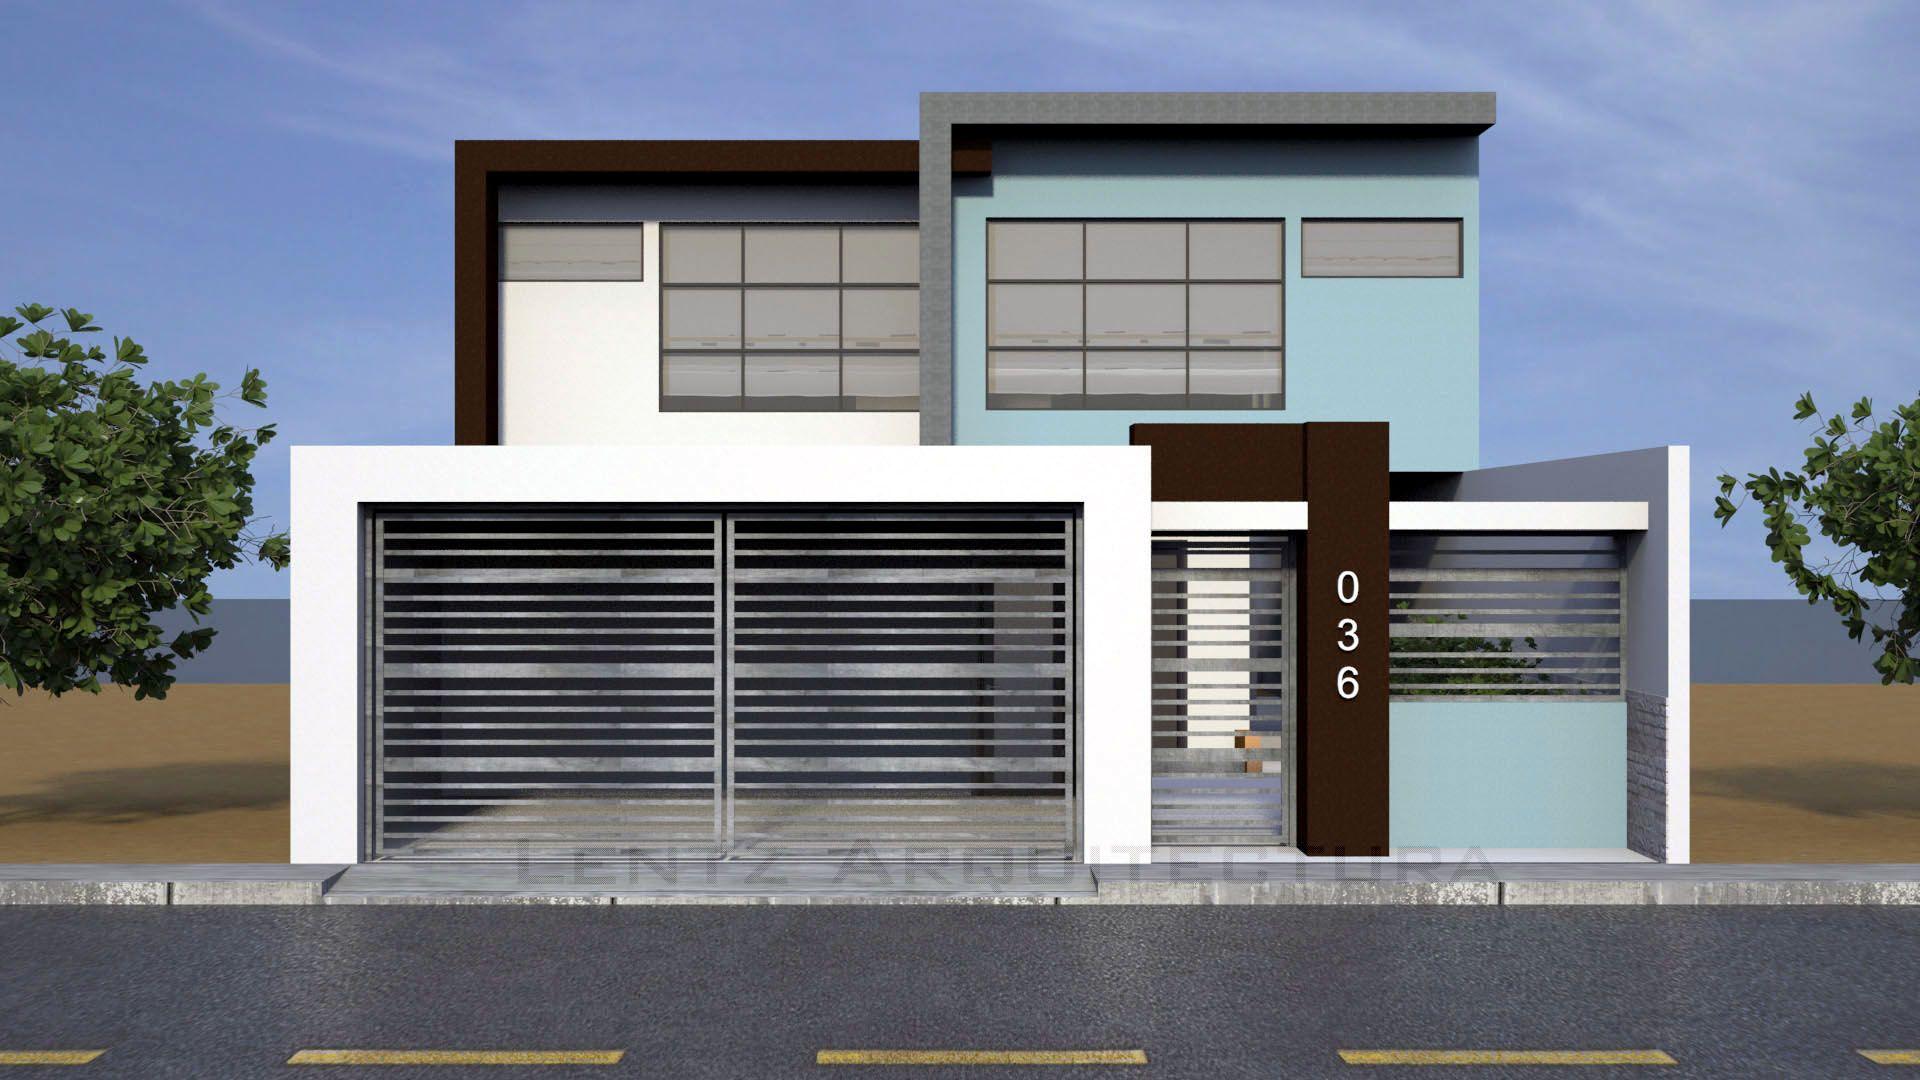 Vaca rivas residence main facade lentz architecture in - Pisos minimalistas modernos ...